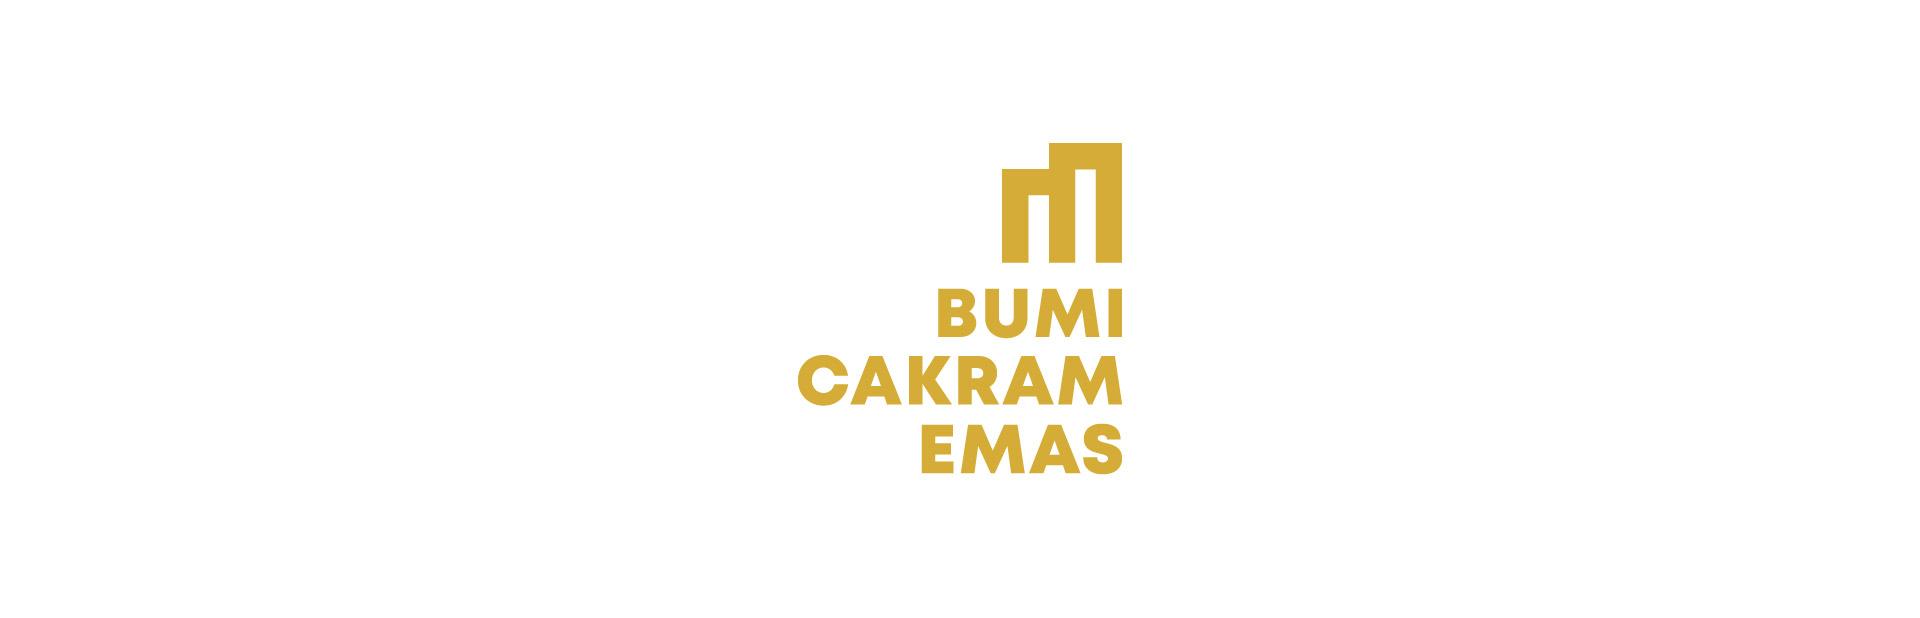 Bumi Cakram Emas | Jakarta, Indonesia | Architecture Firm | 2018